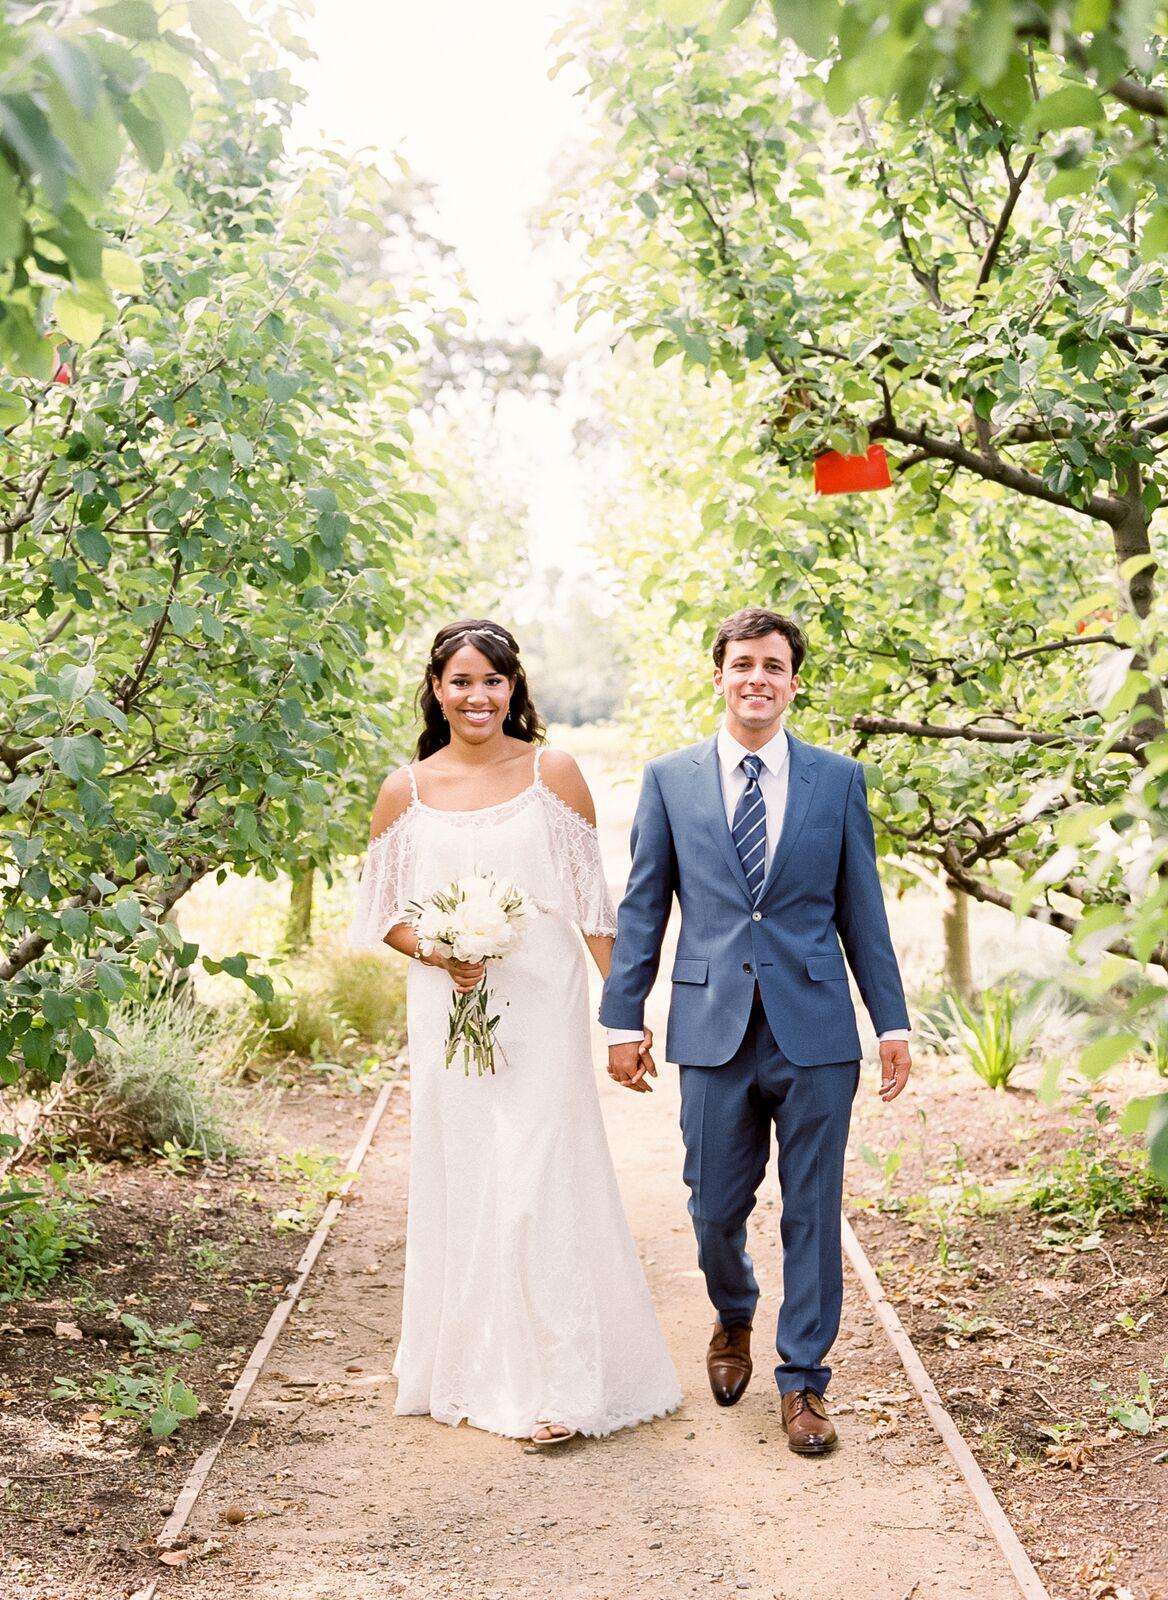 bohemian-lace-wedding-dress-5.jpg